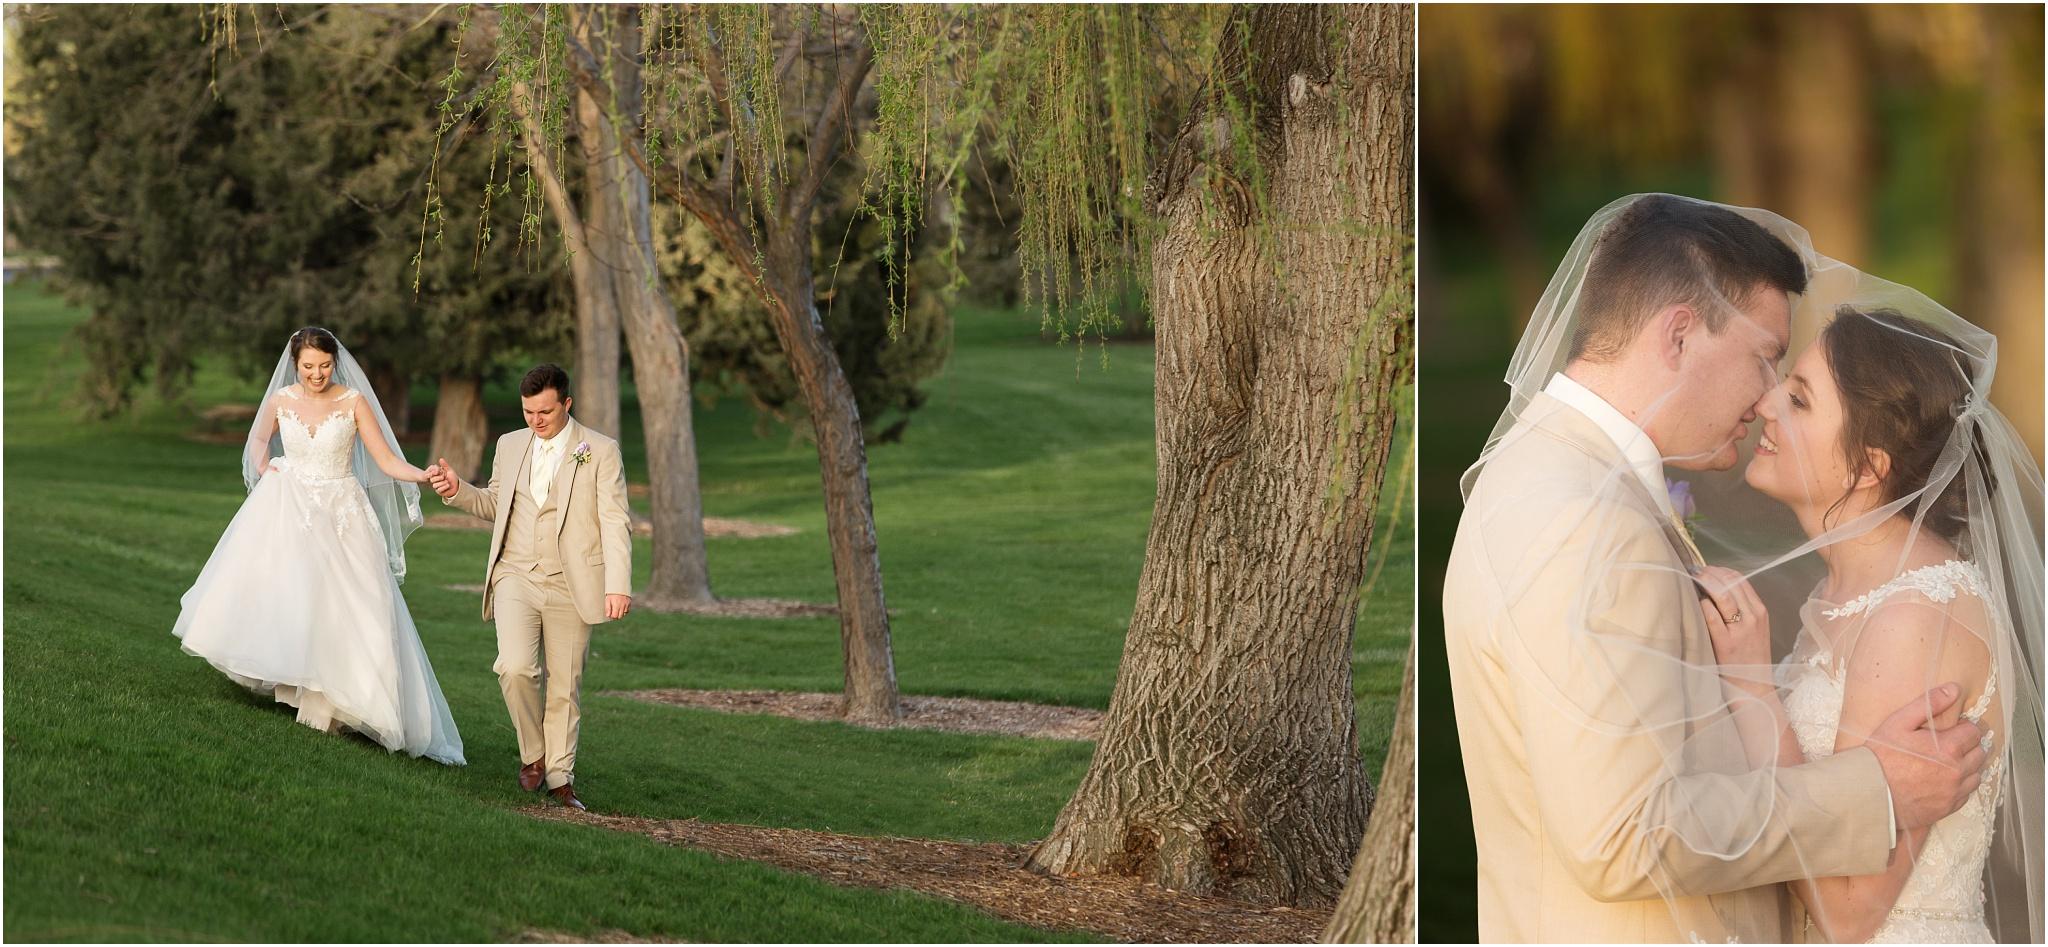 Wedding Photography_Meridian Idaho_Nampa Idaho_Leah Southwick Photography_0076.jpg